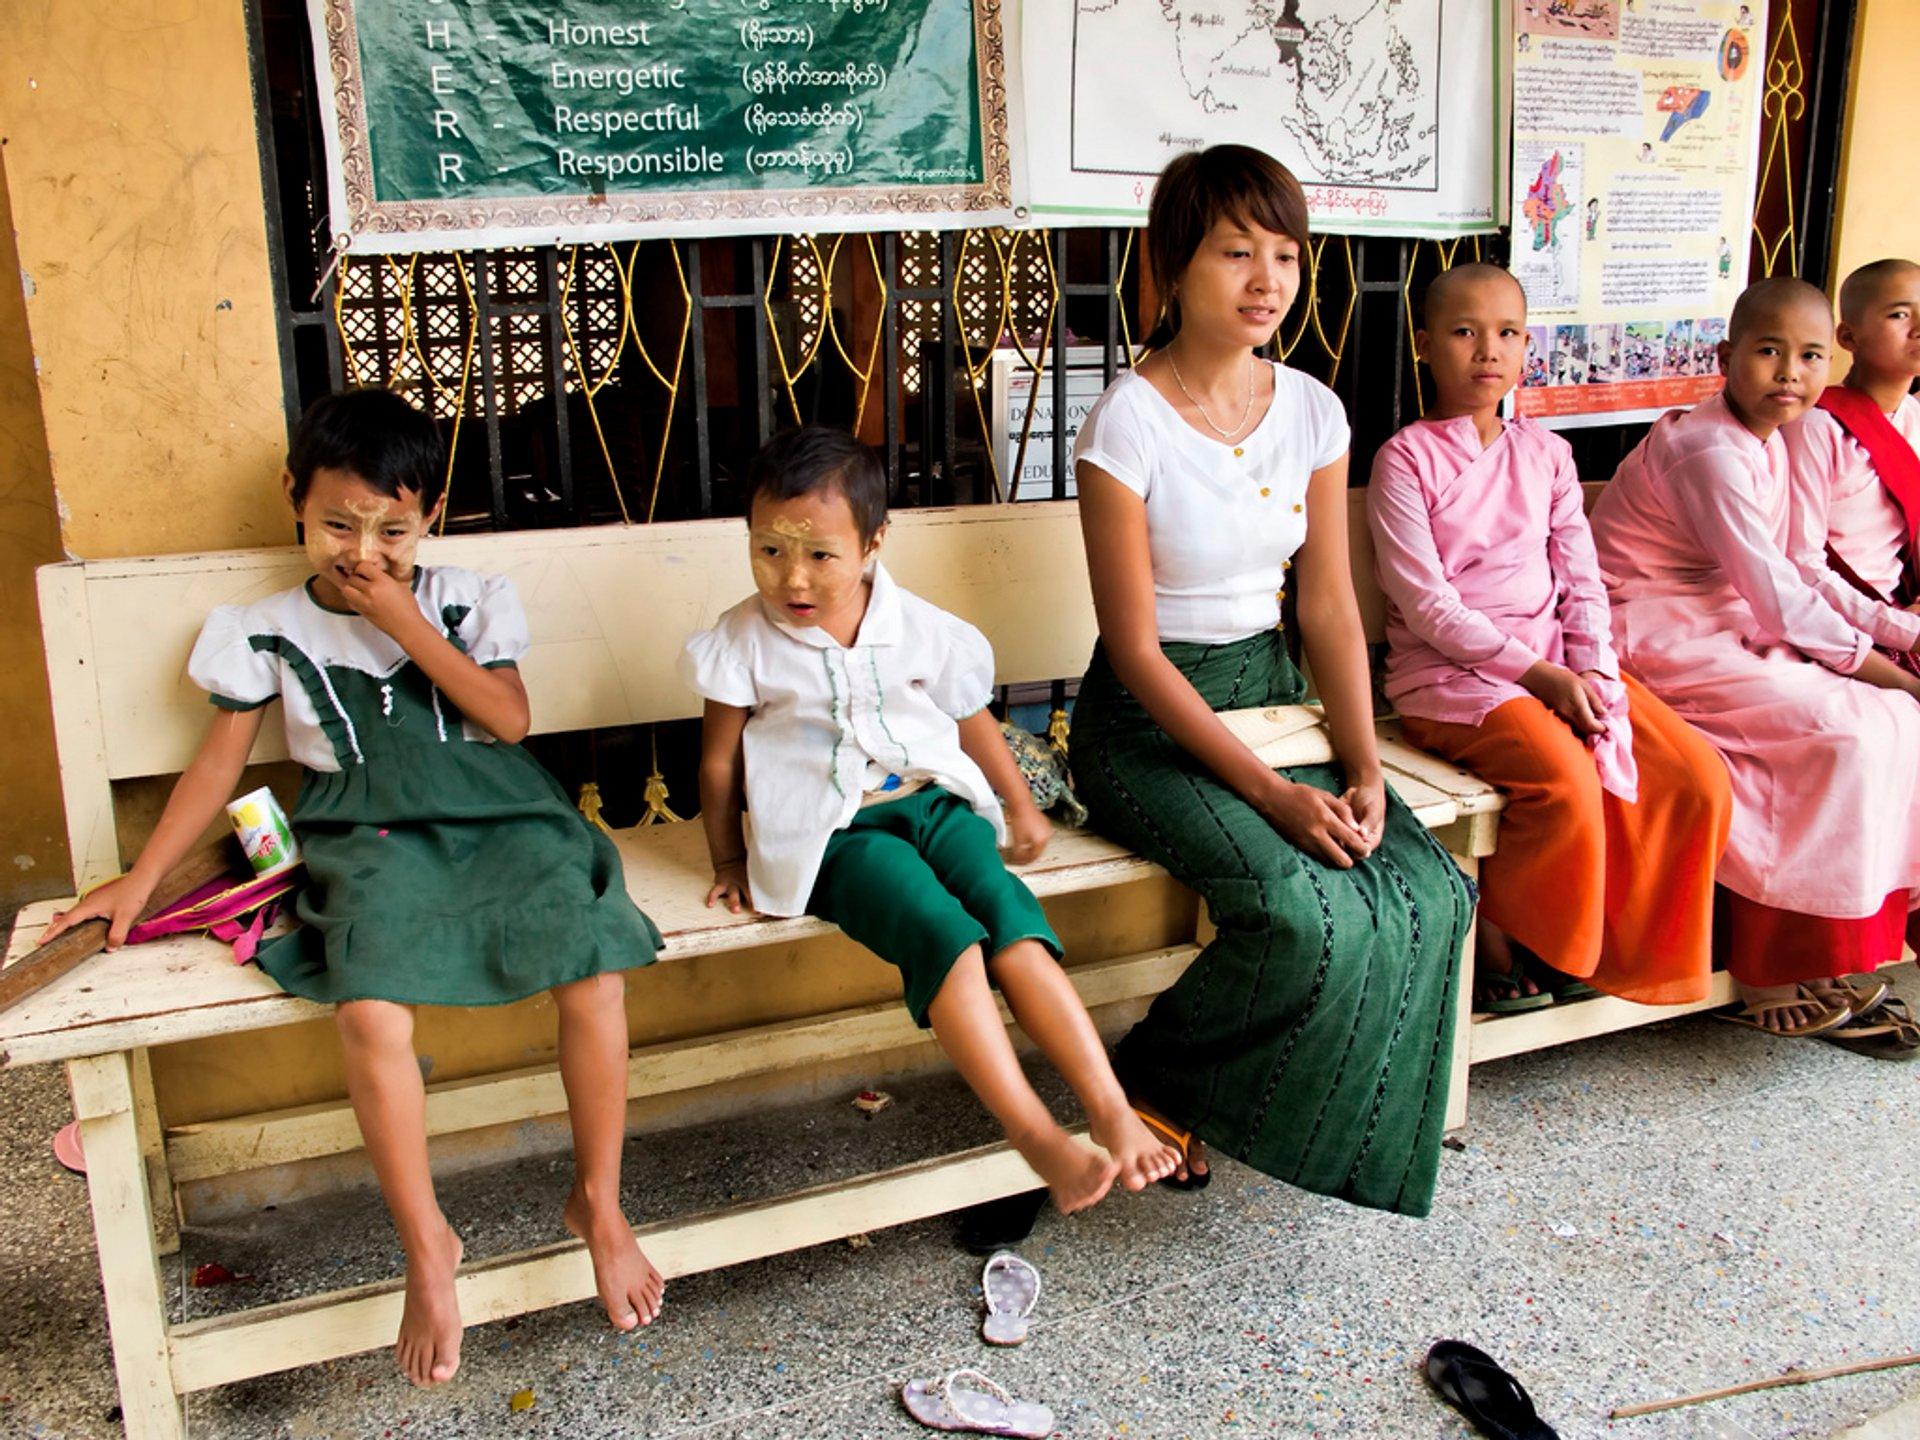 A teacher and some students at Aung Myae OO Monastic Education School, Sagaing, Myanmar 2020